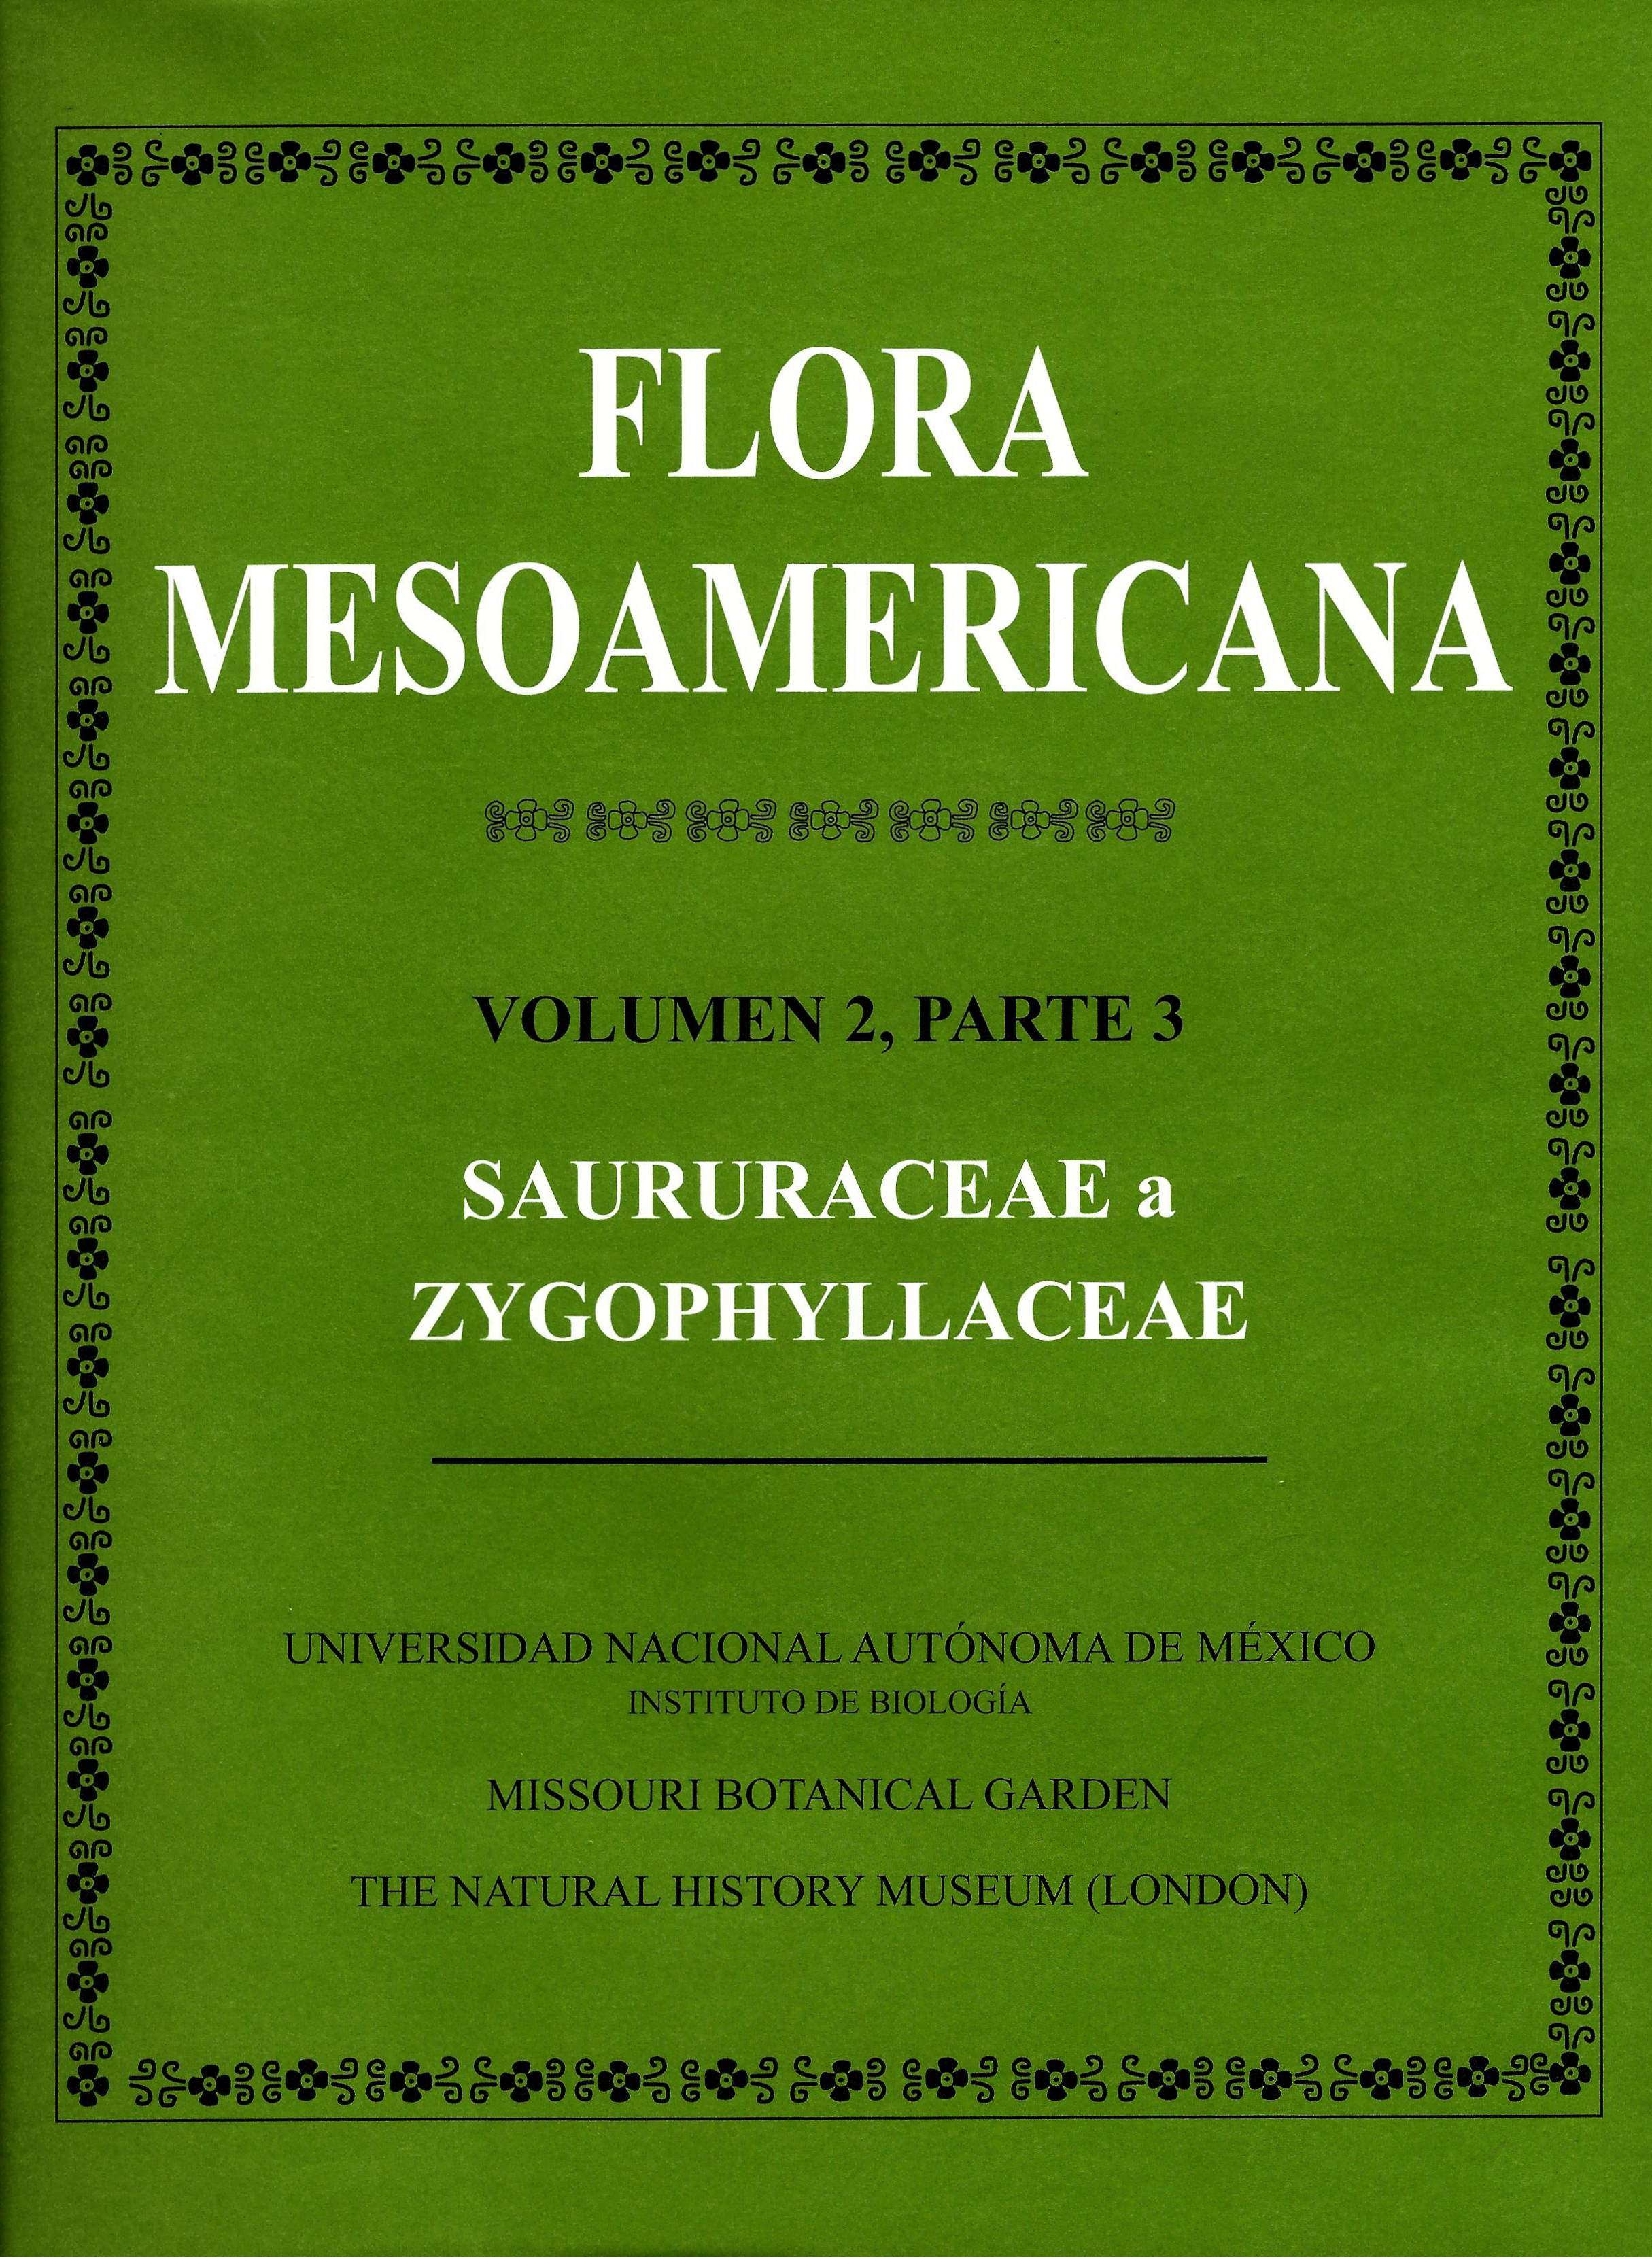 Flora mesoamericana. Vol. 2, parte 3